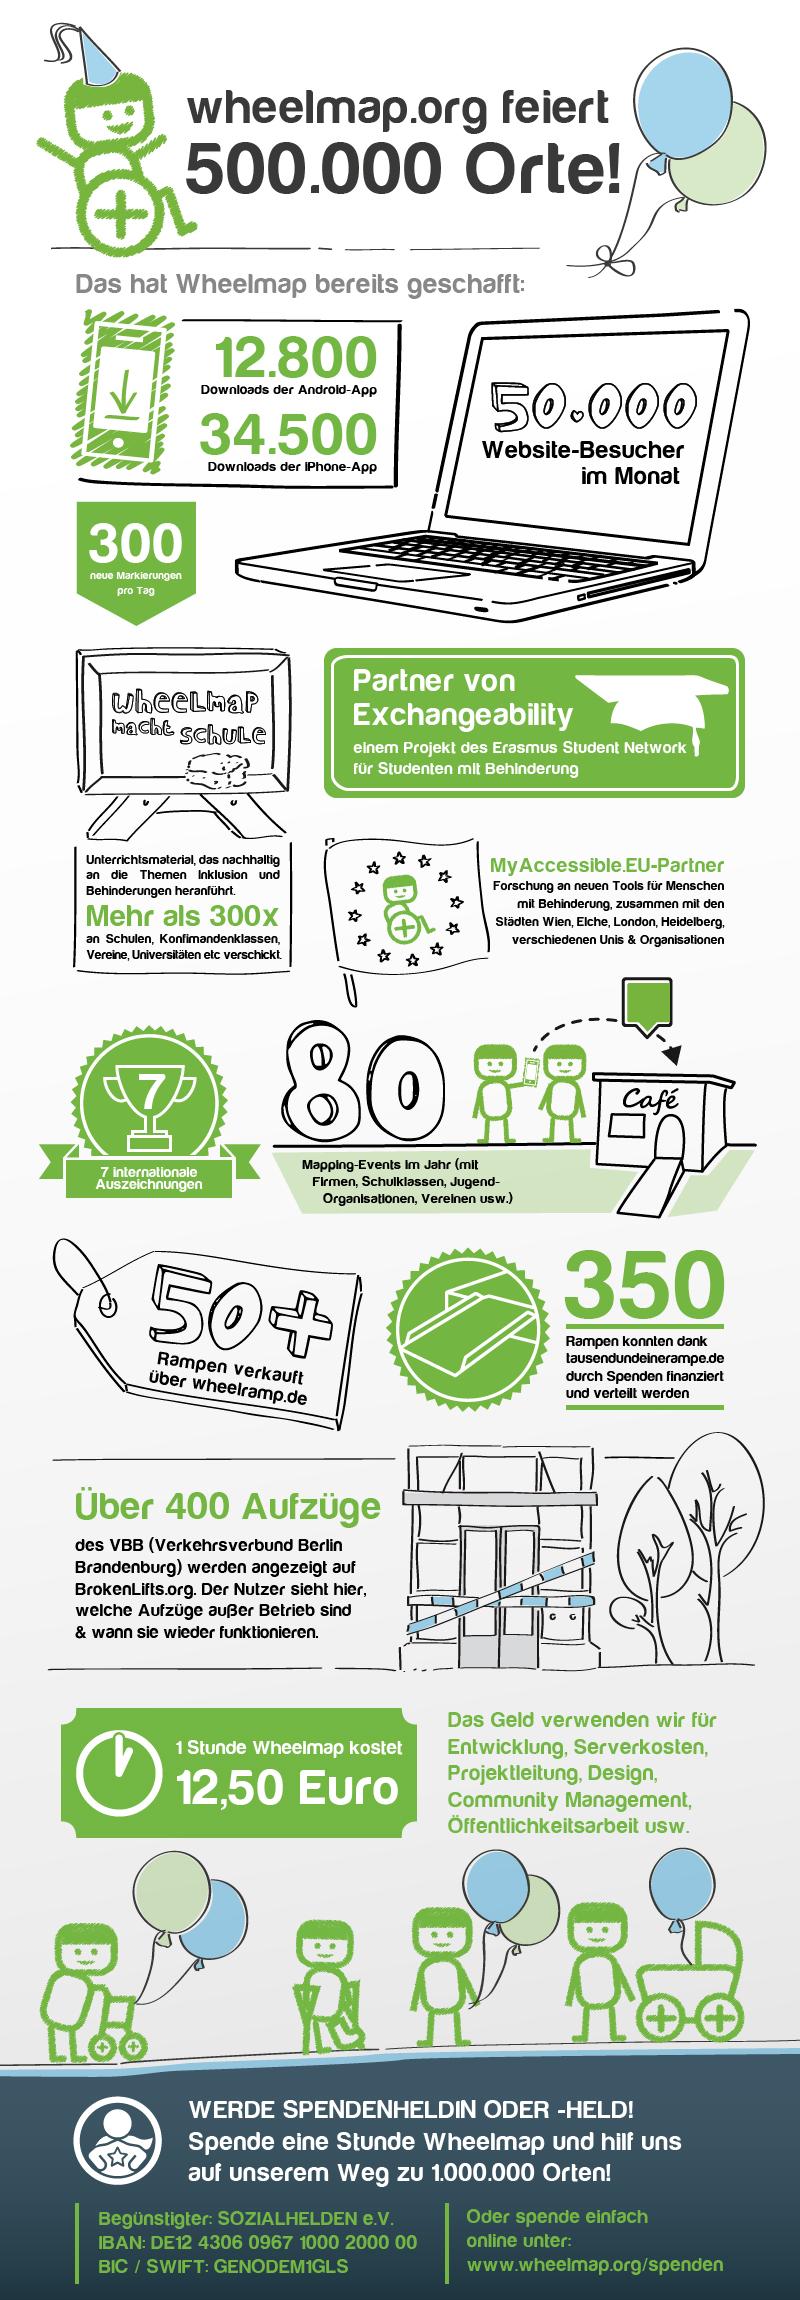 Wheelmap_Infografik_500000Orte